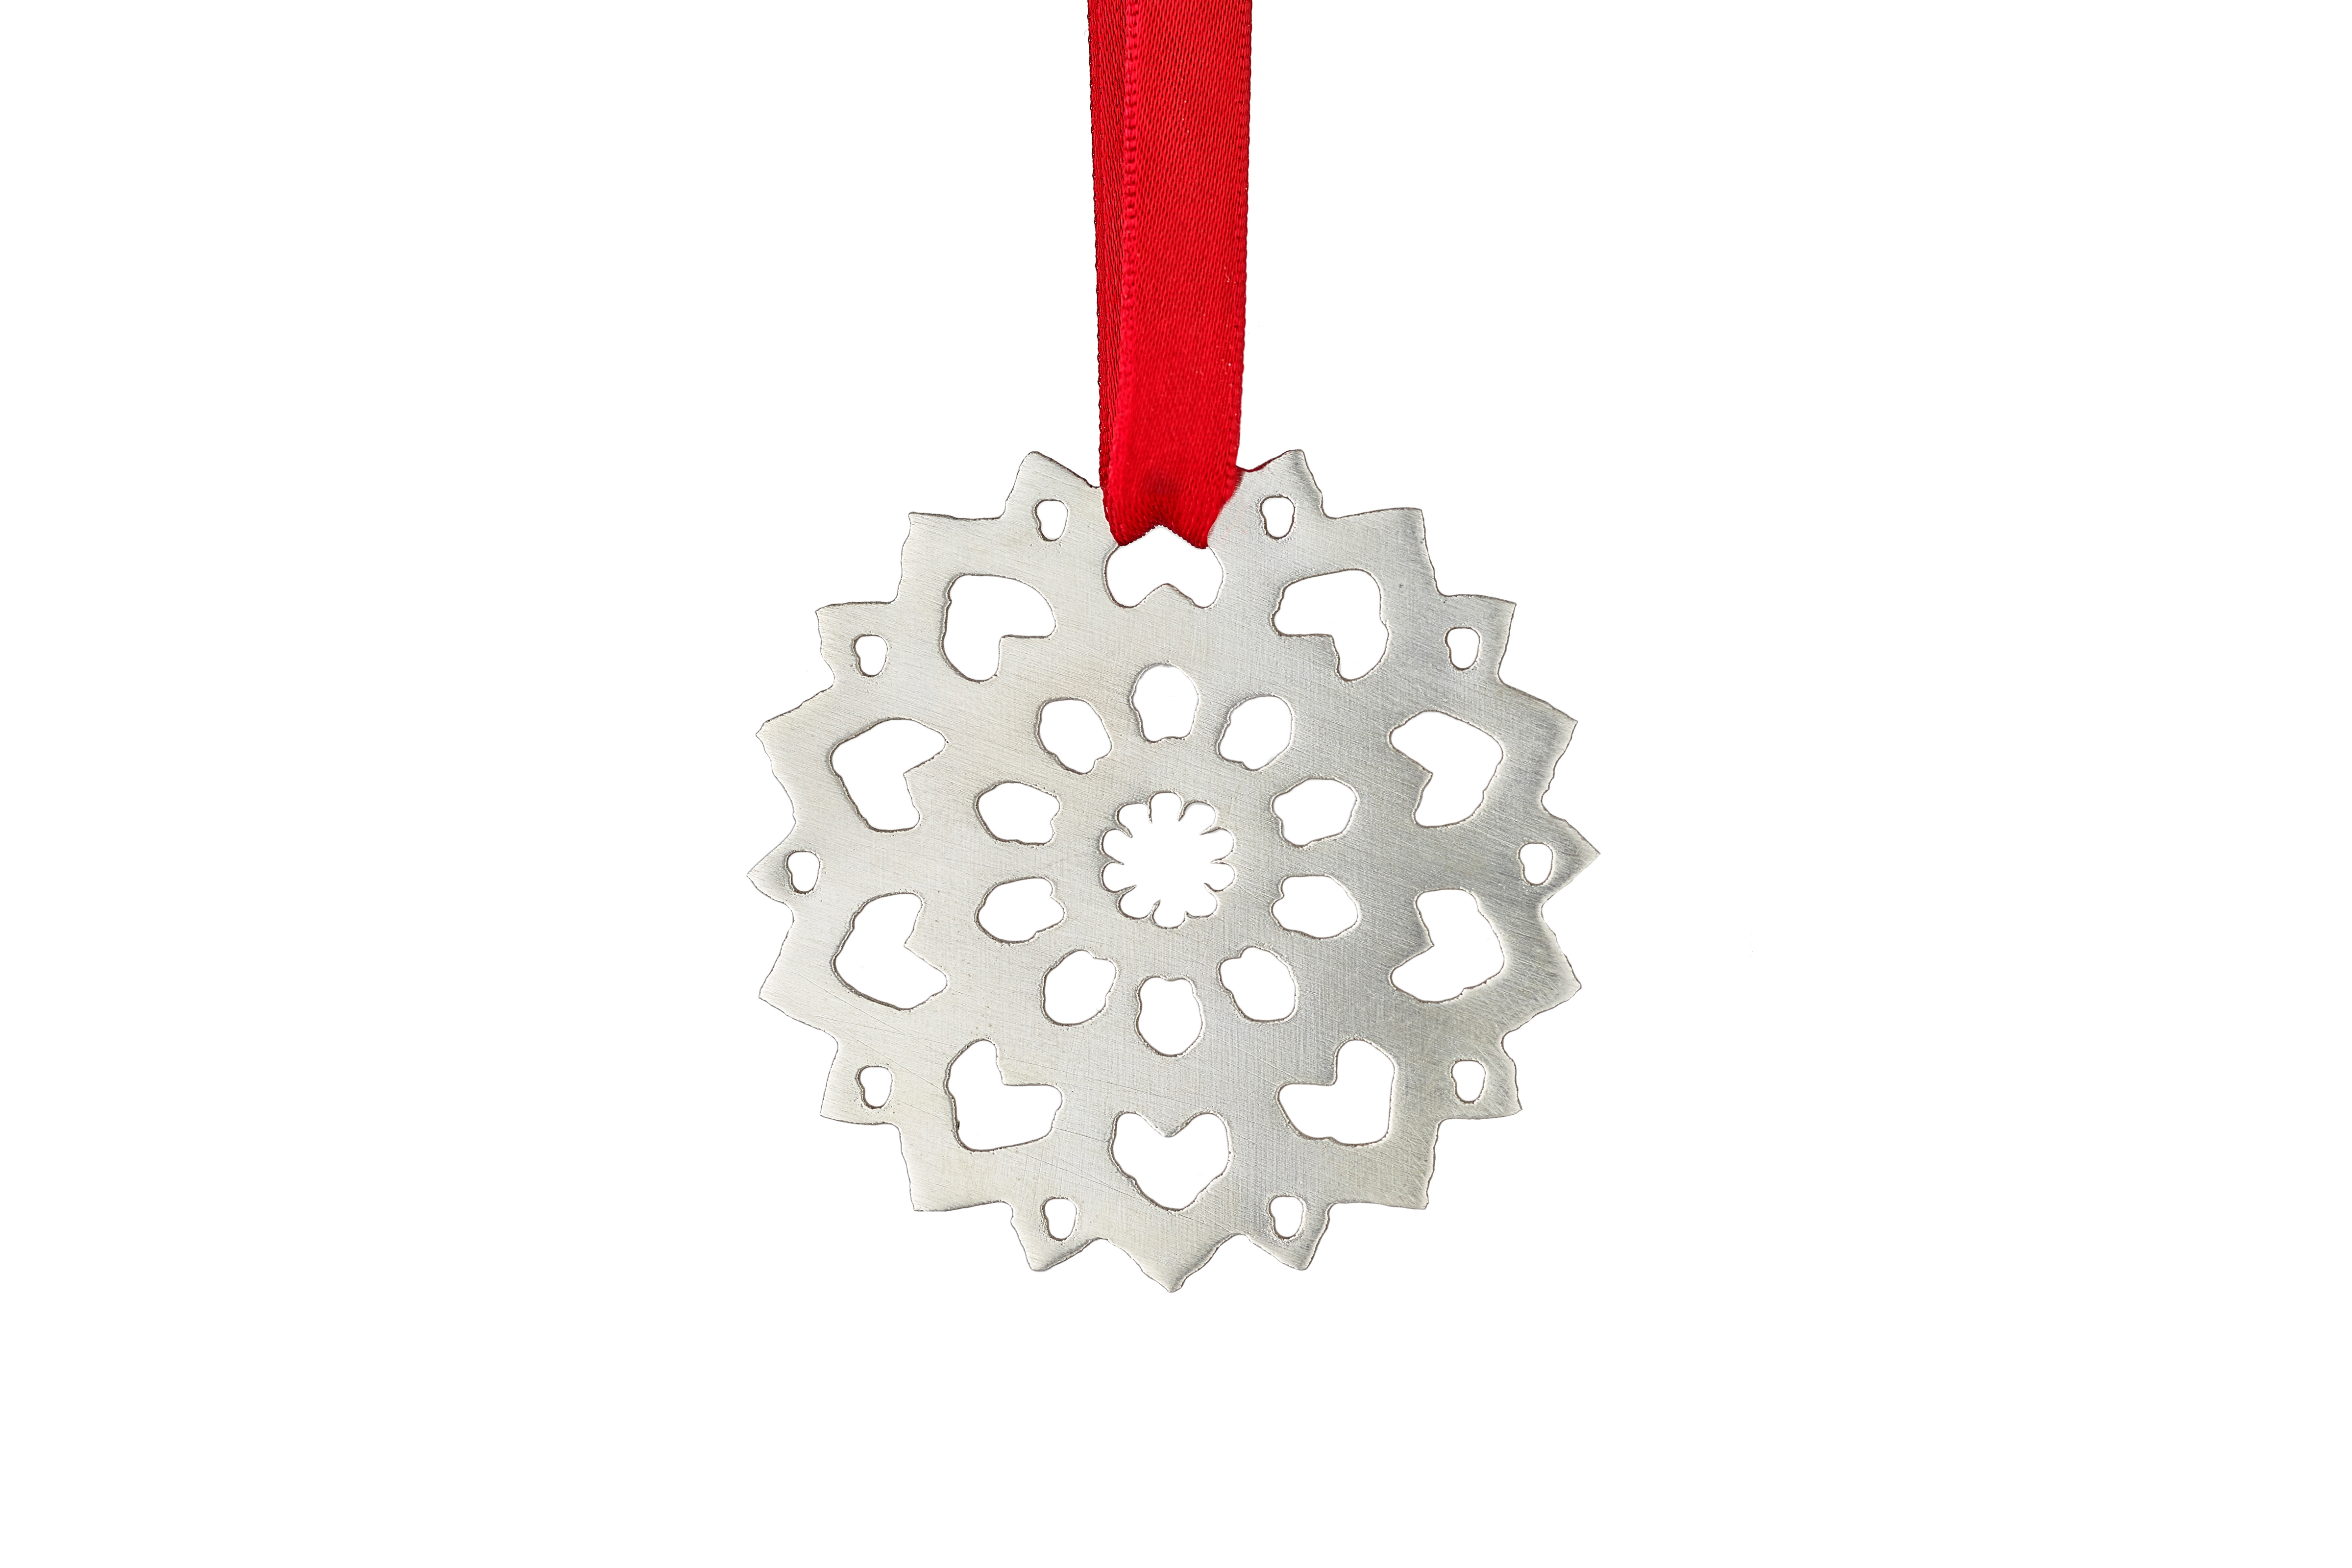 Medium Frosted Snowflake 3 – Copyright BJRdesigns